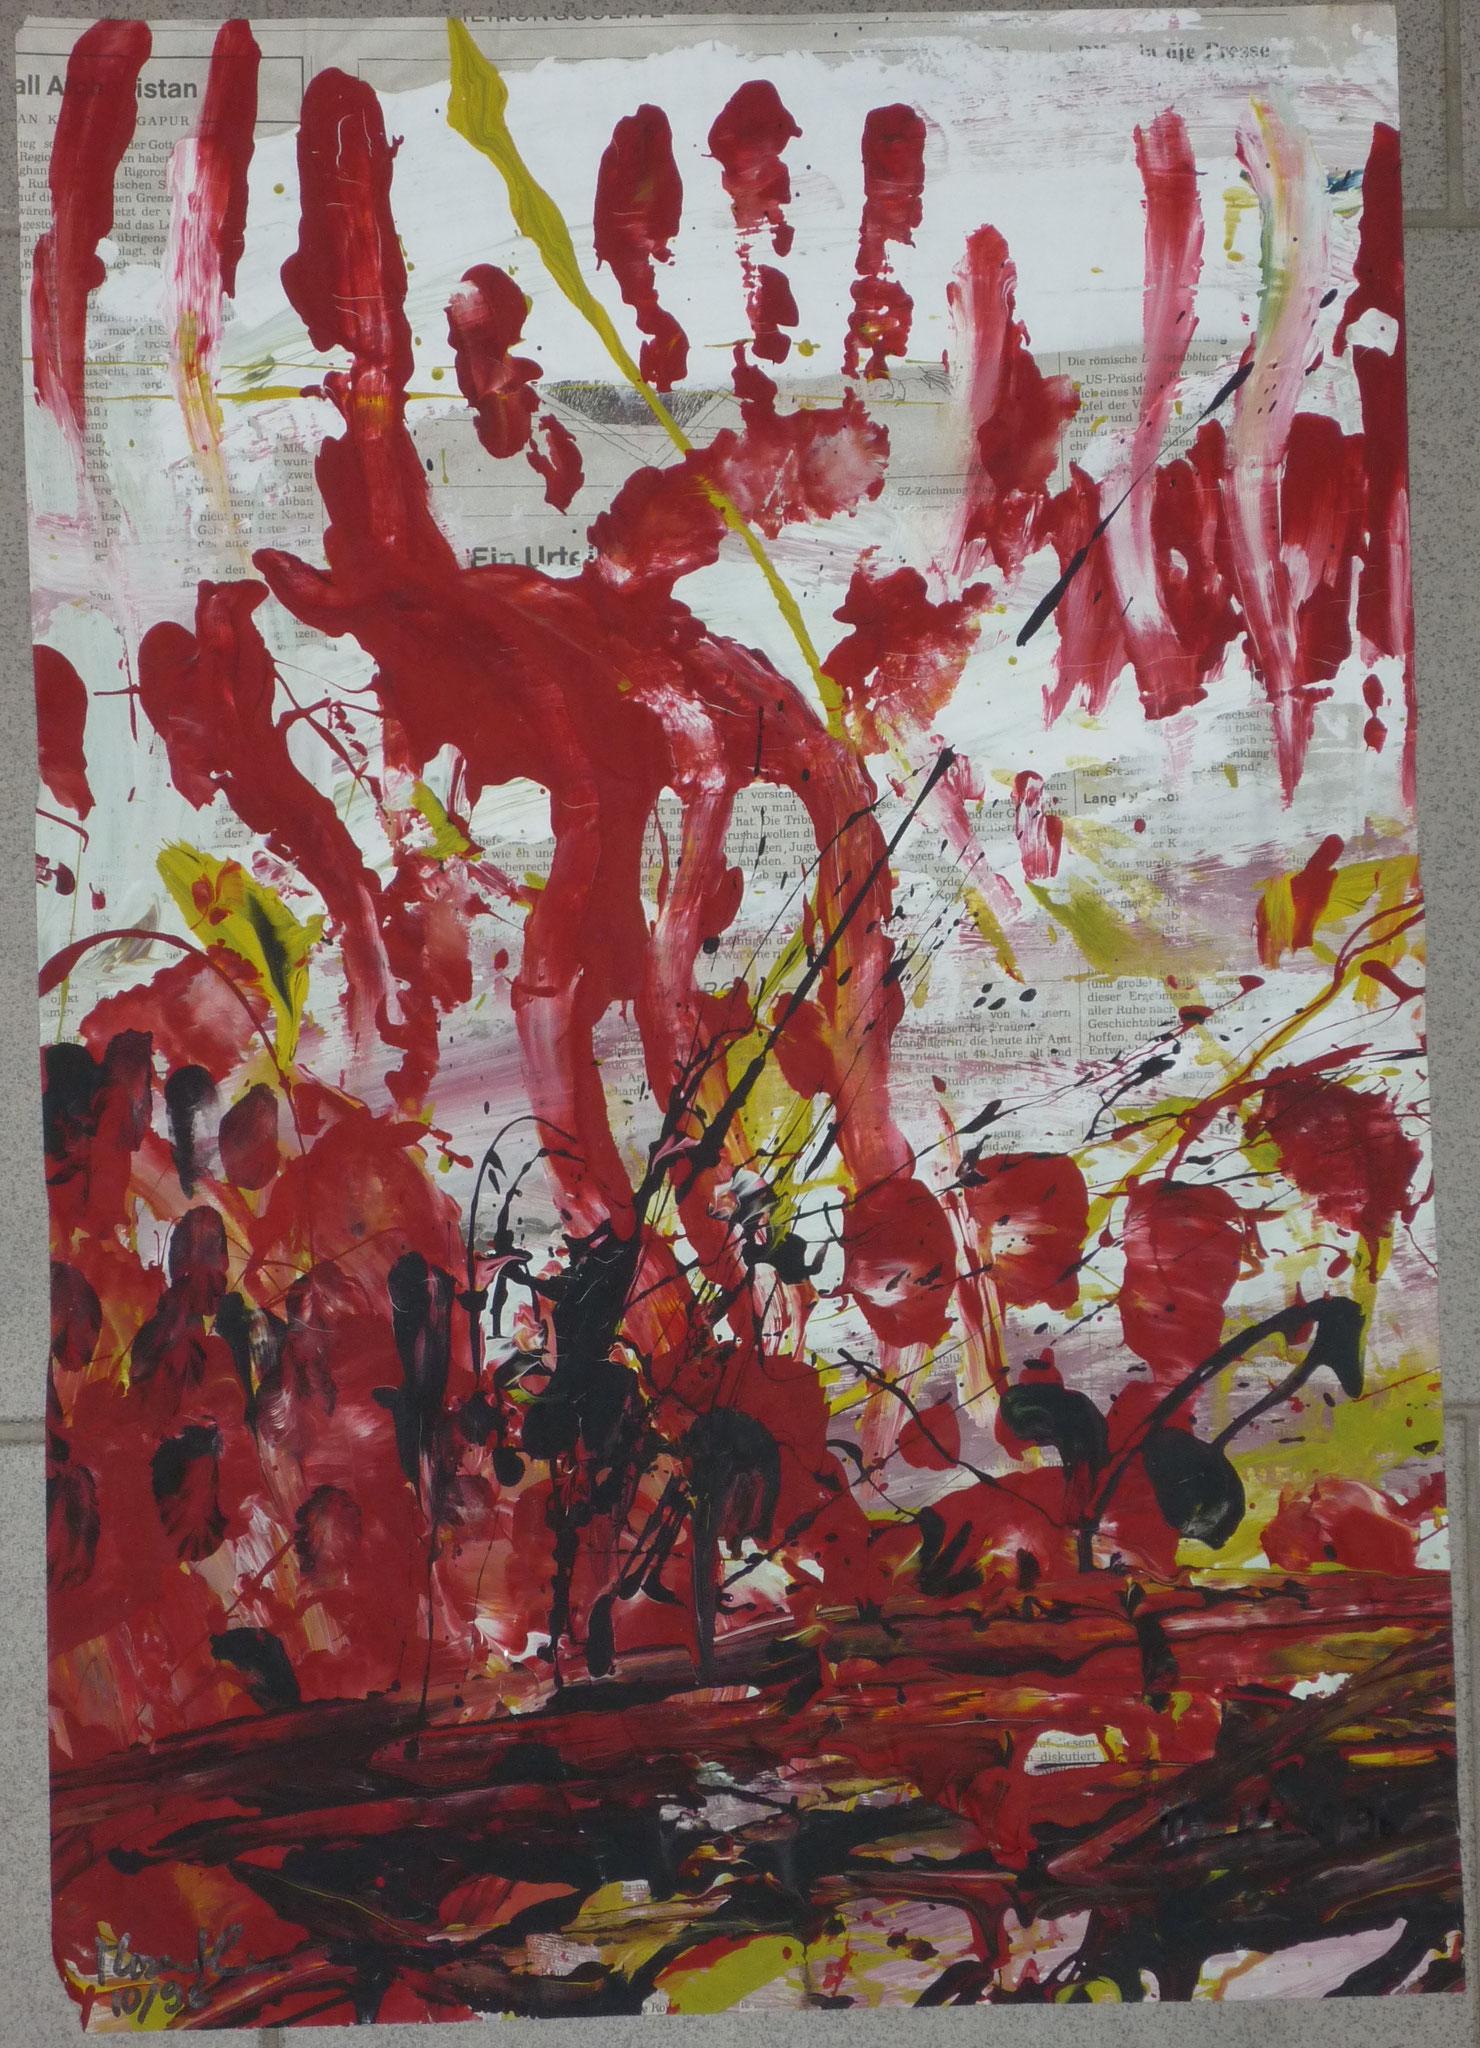 Rote Finger, 1996, 34x50cm, Zeitung